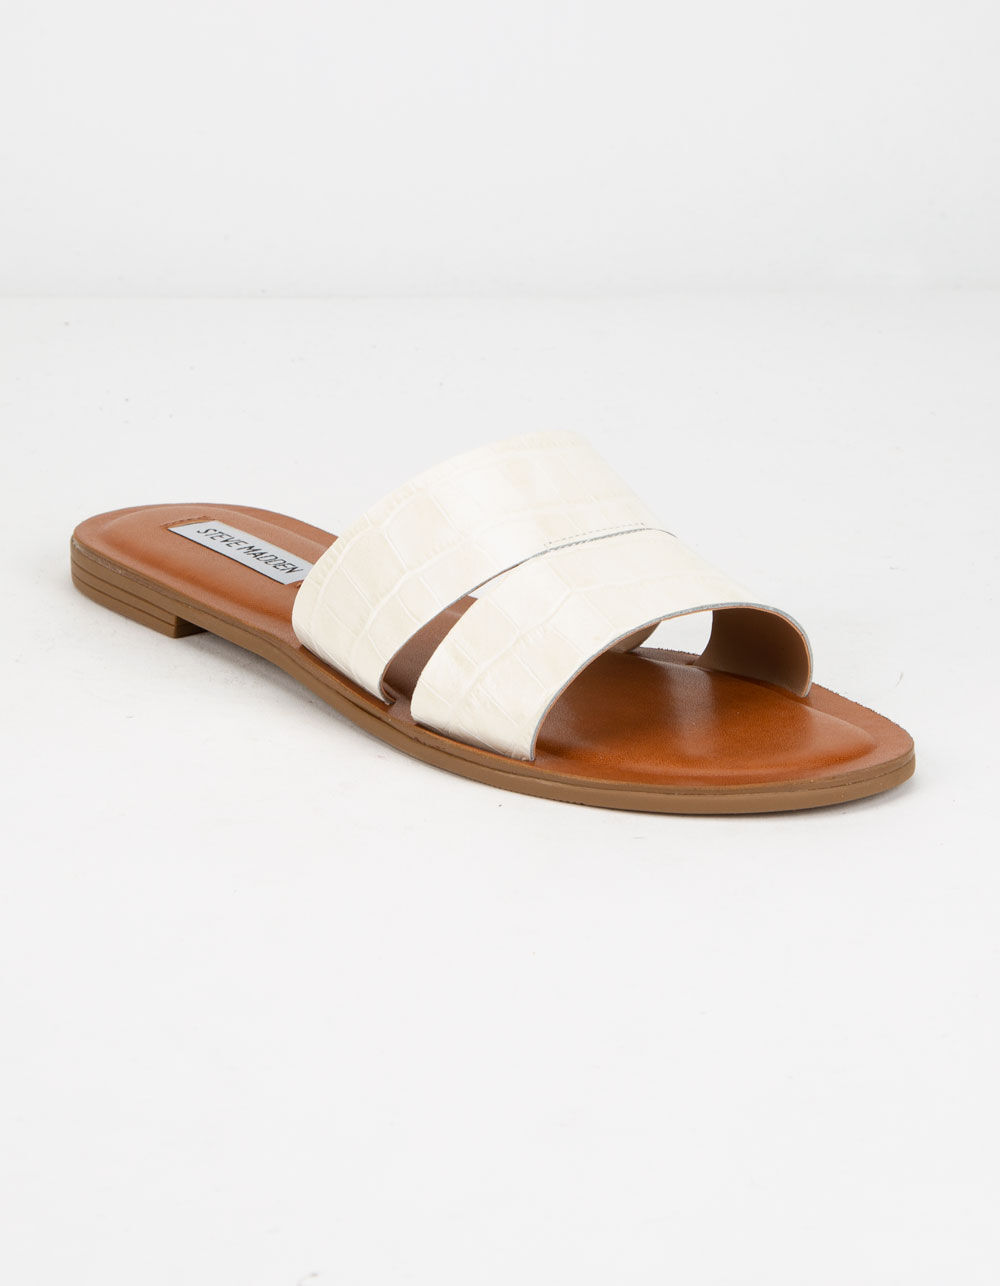 STEVE MADDEN Alexandra White Crocodile Sandals